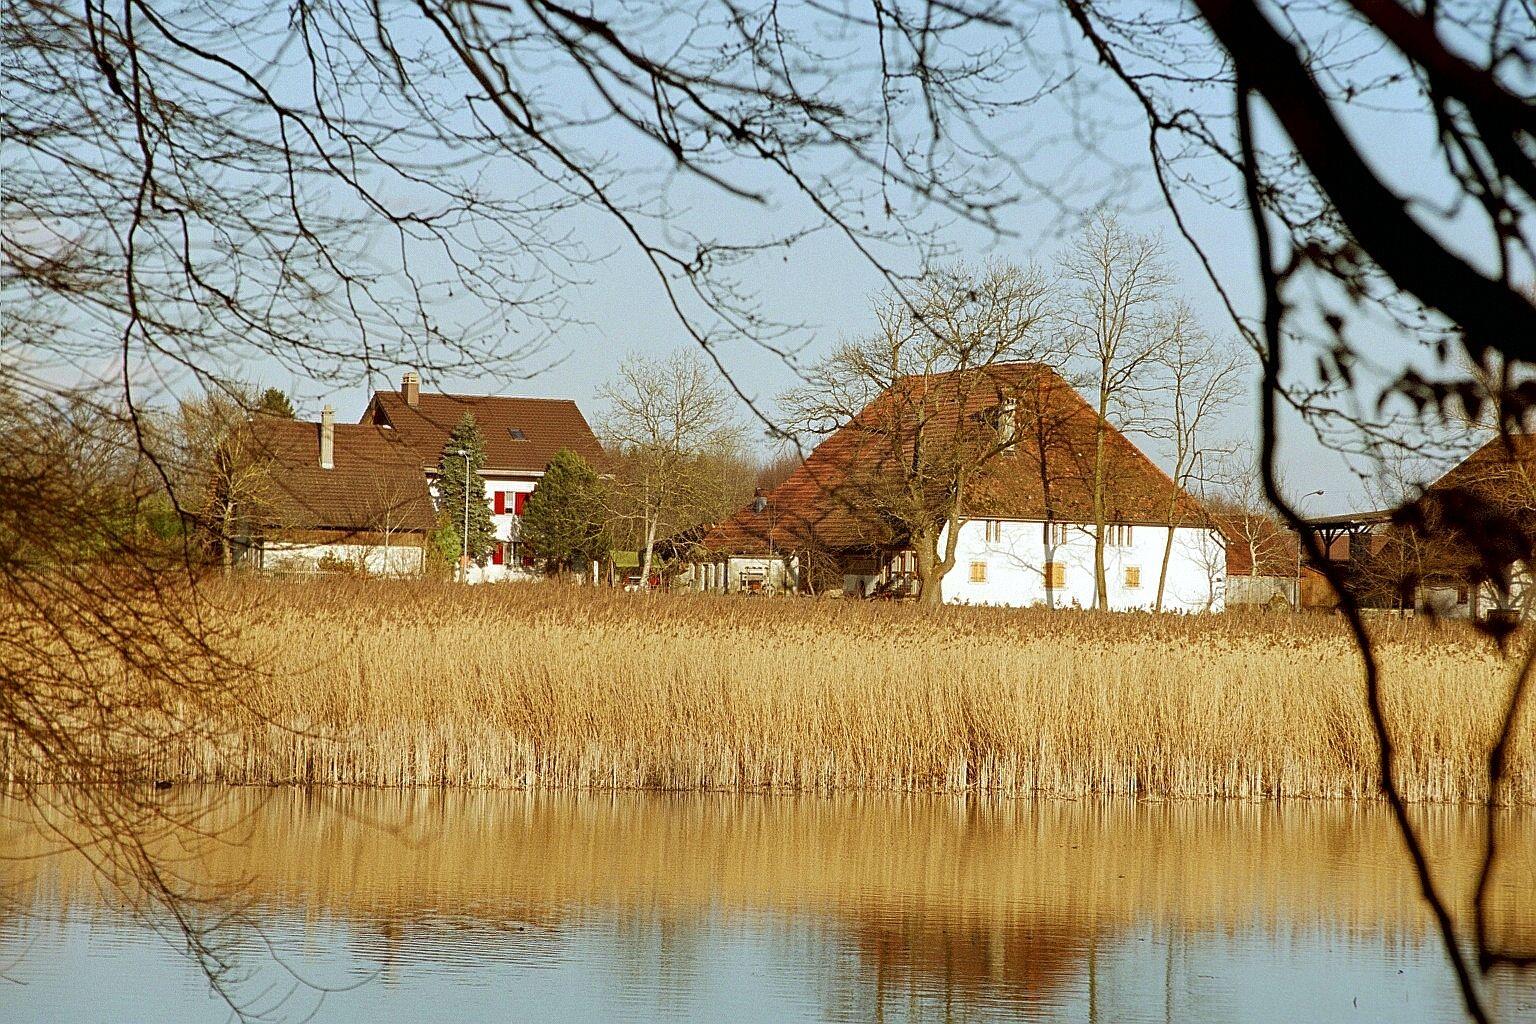 Unser Bauernhof direkt am Naturschutzgebiet